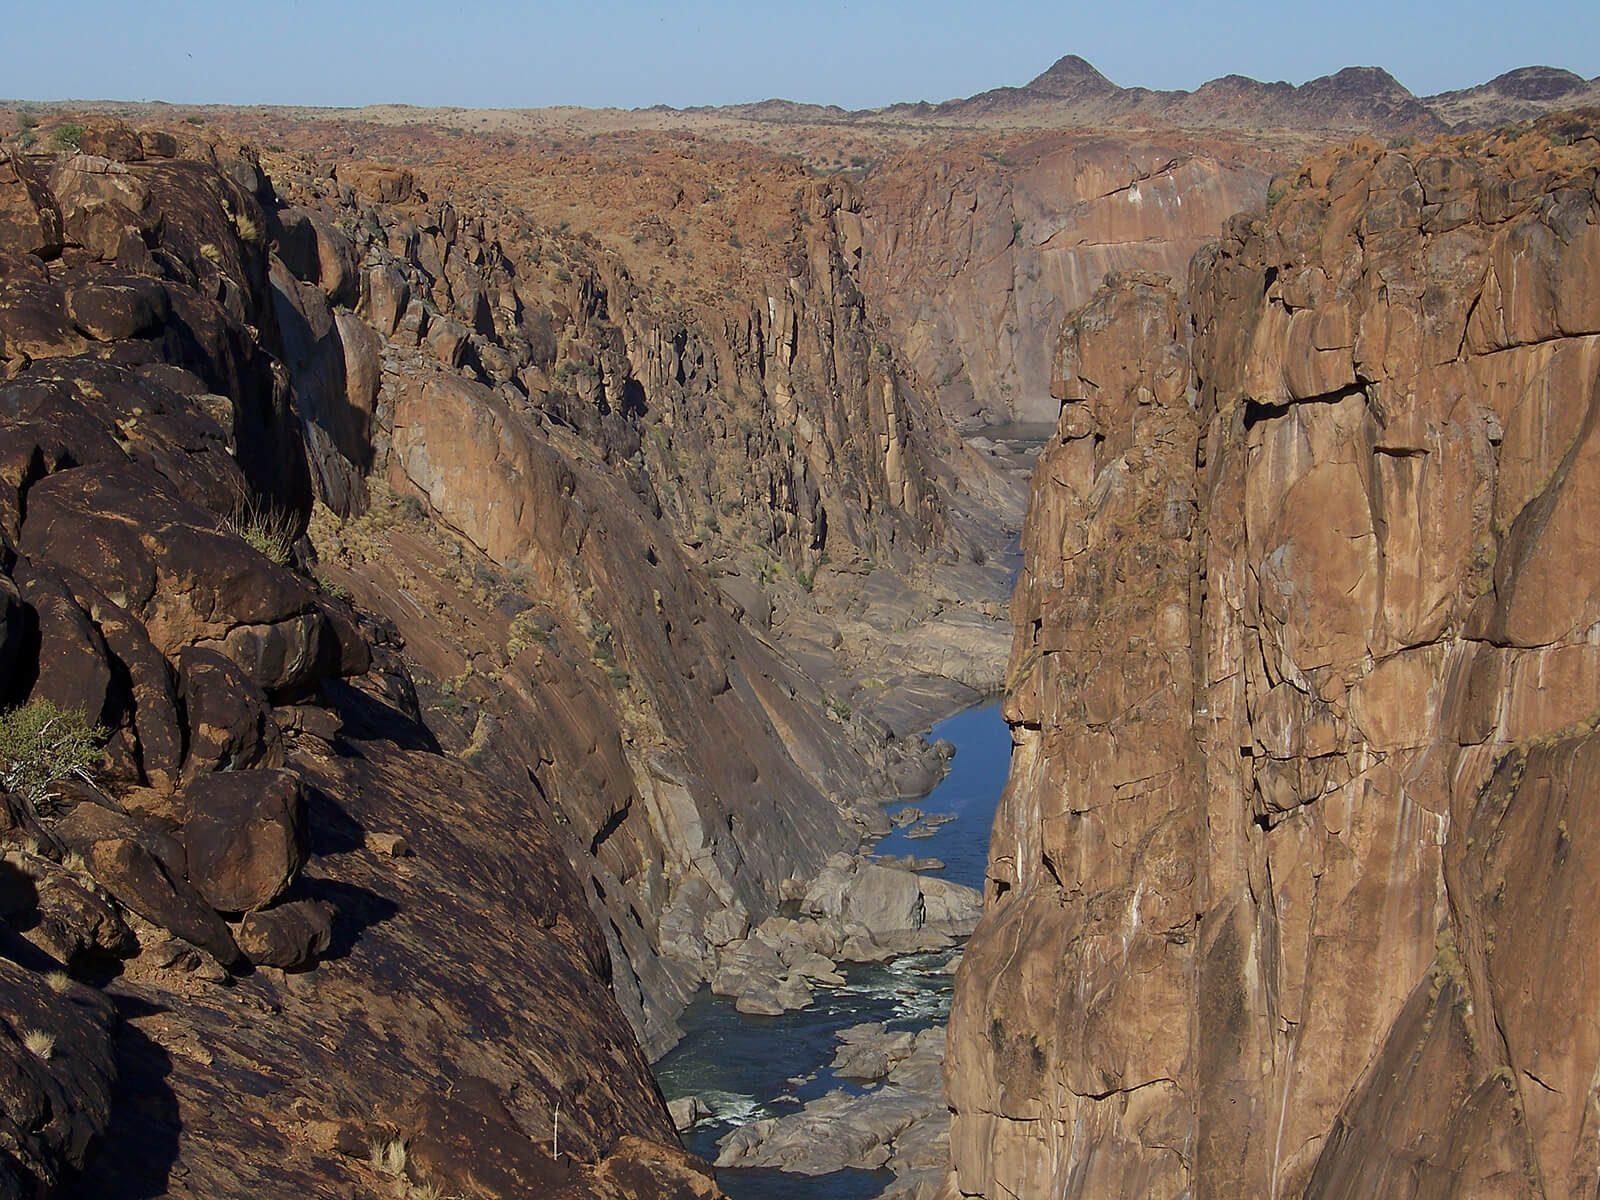 Monumentenplaatsje Tulbagh ligt in prachtige vallei | AmbianceTravel